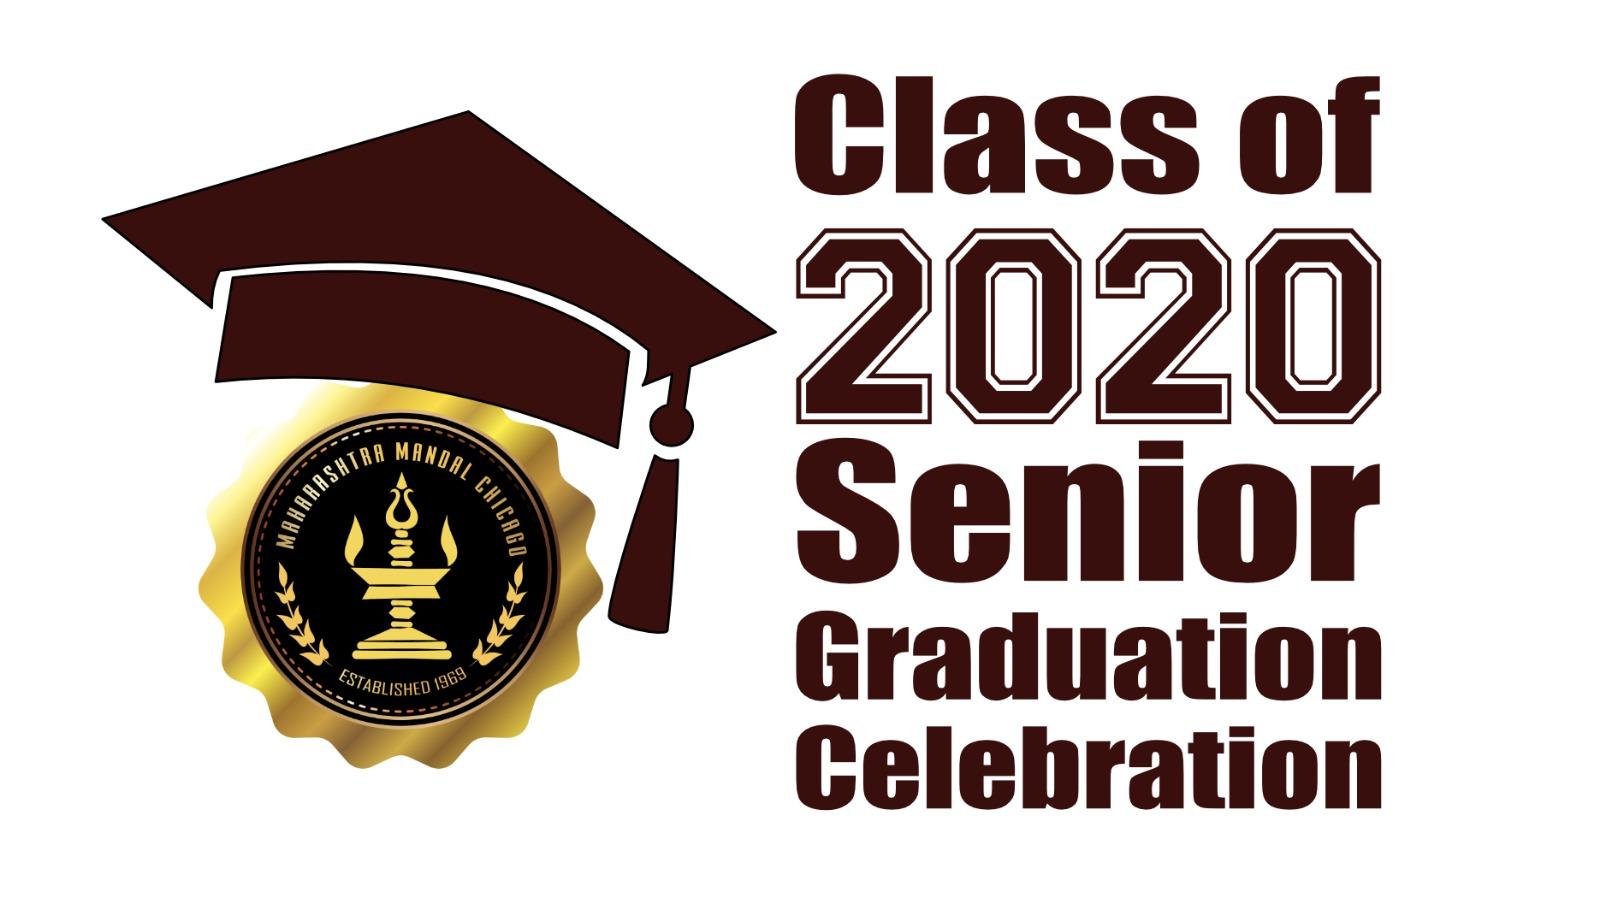 Class of 2020 Graduation celebration